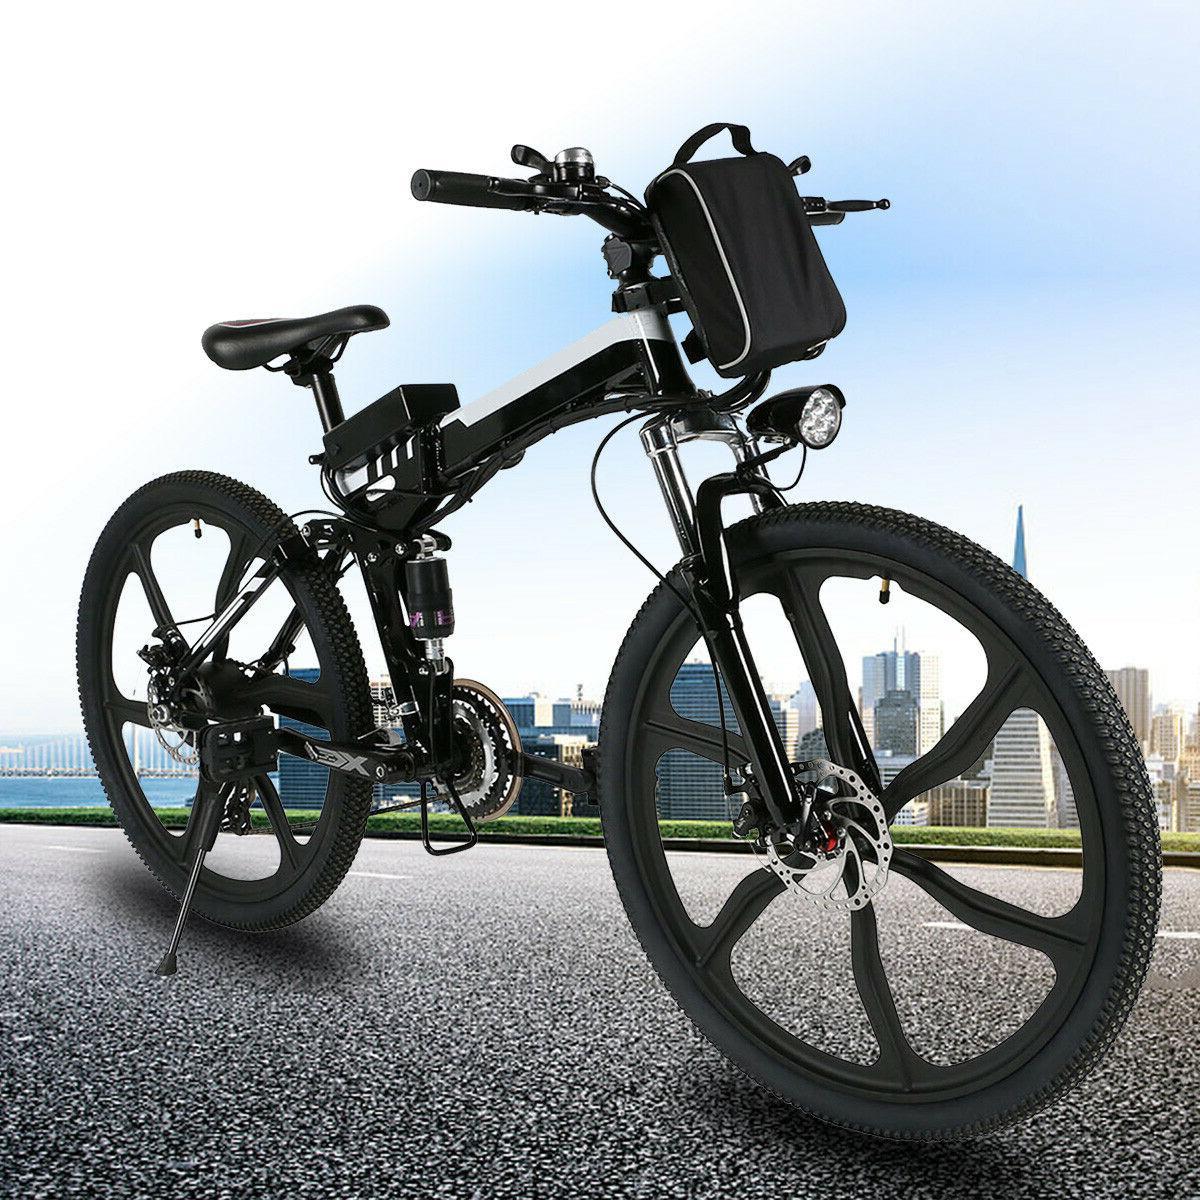 26INCH Electric Bike Folding Bicycle